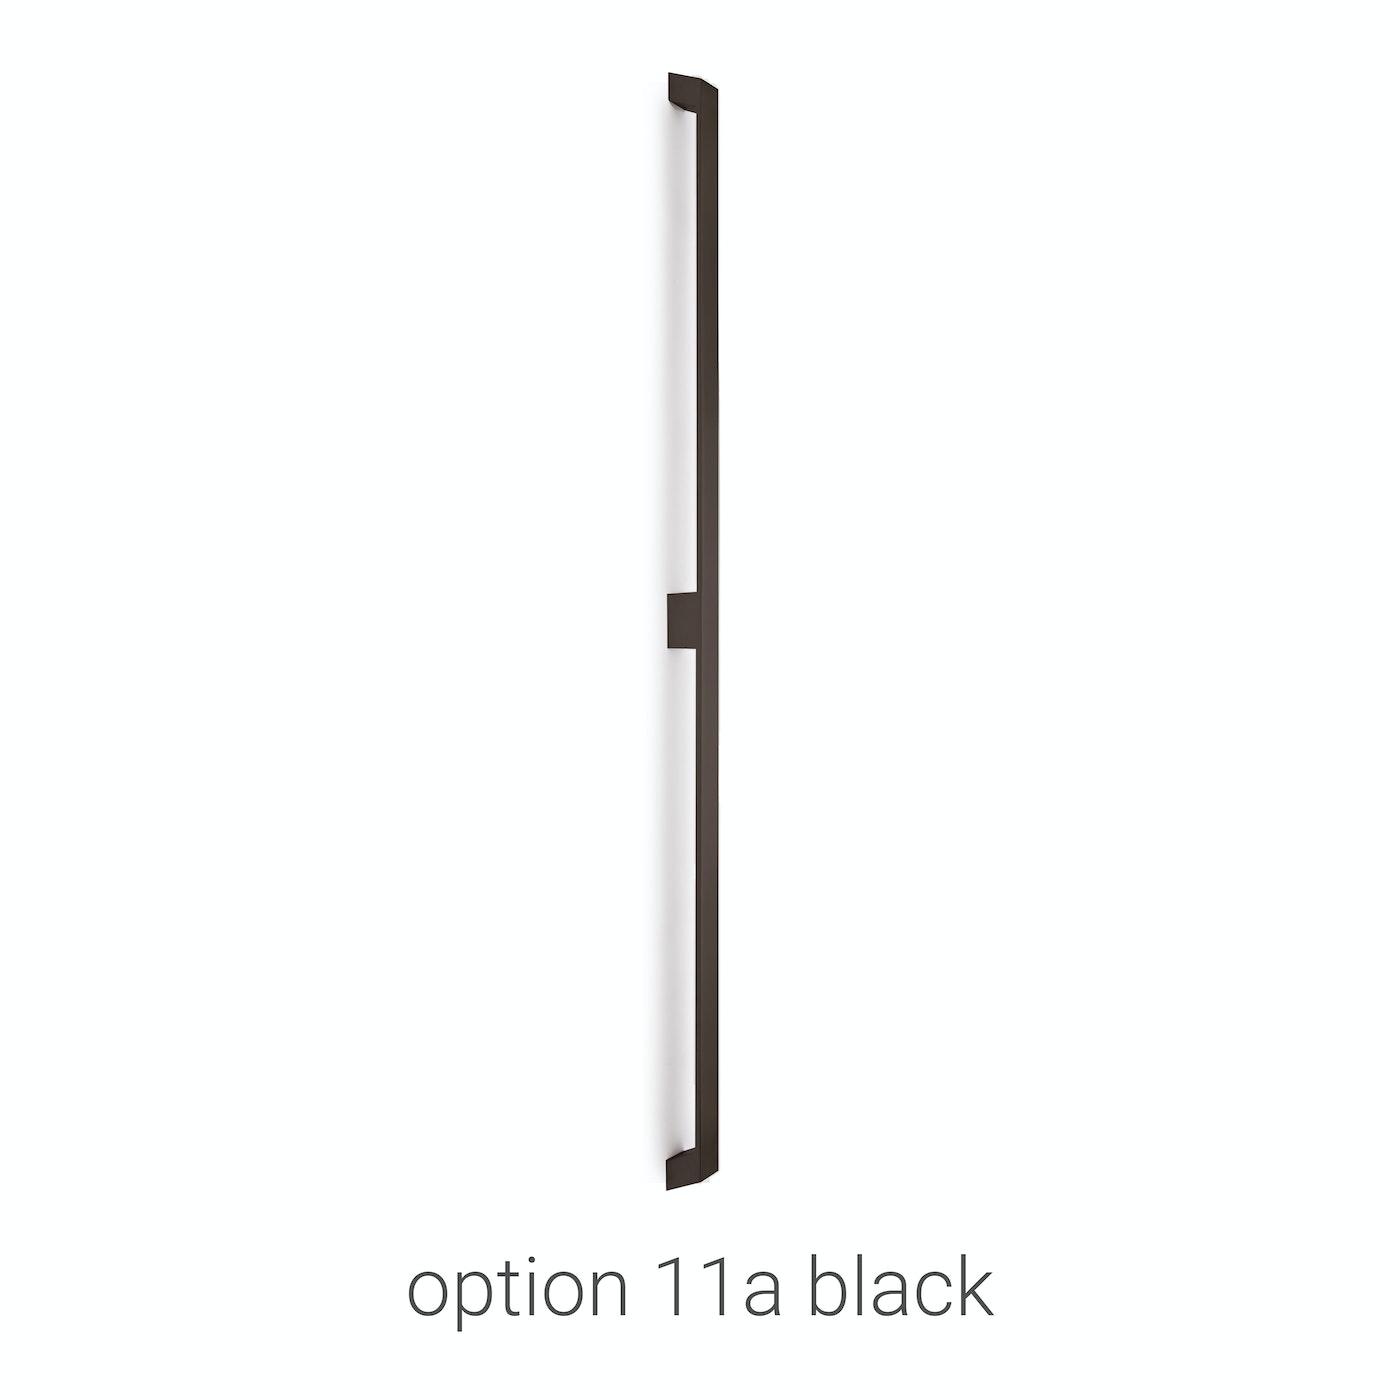 handles stainless steel door Urban Front option 11a black